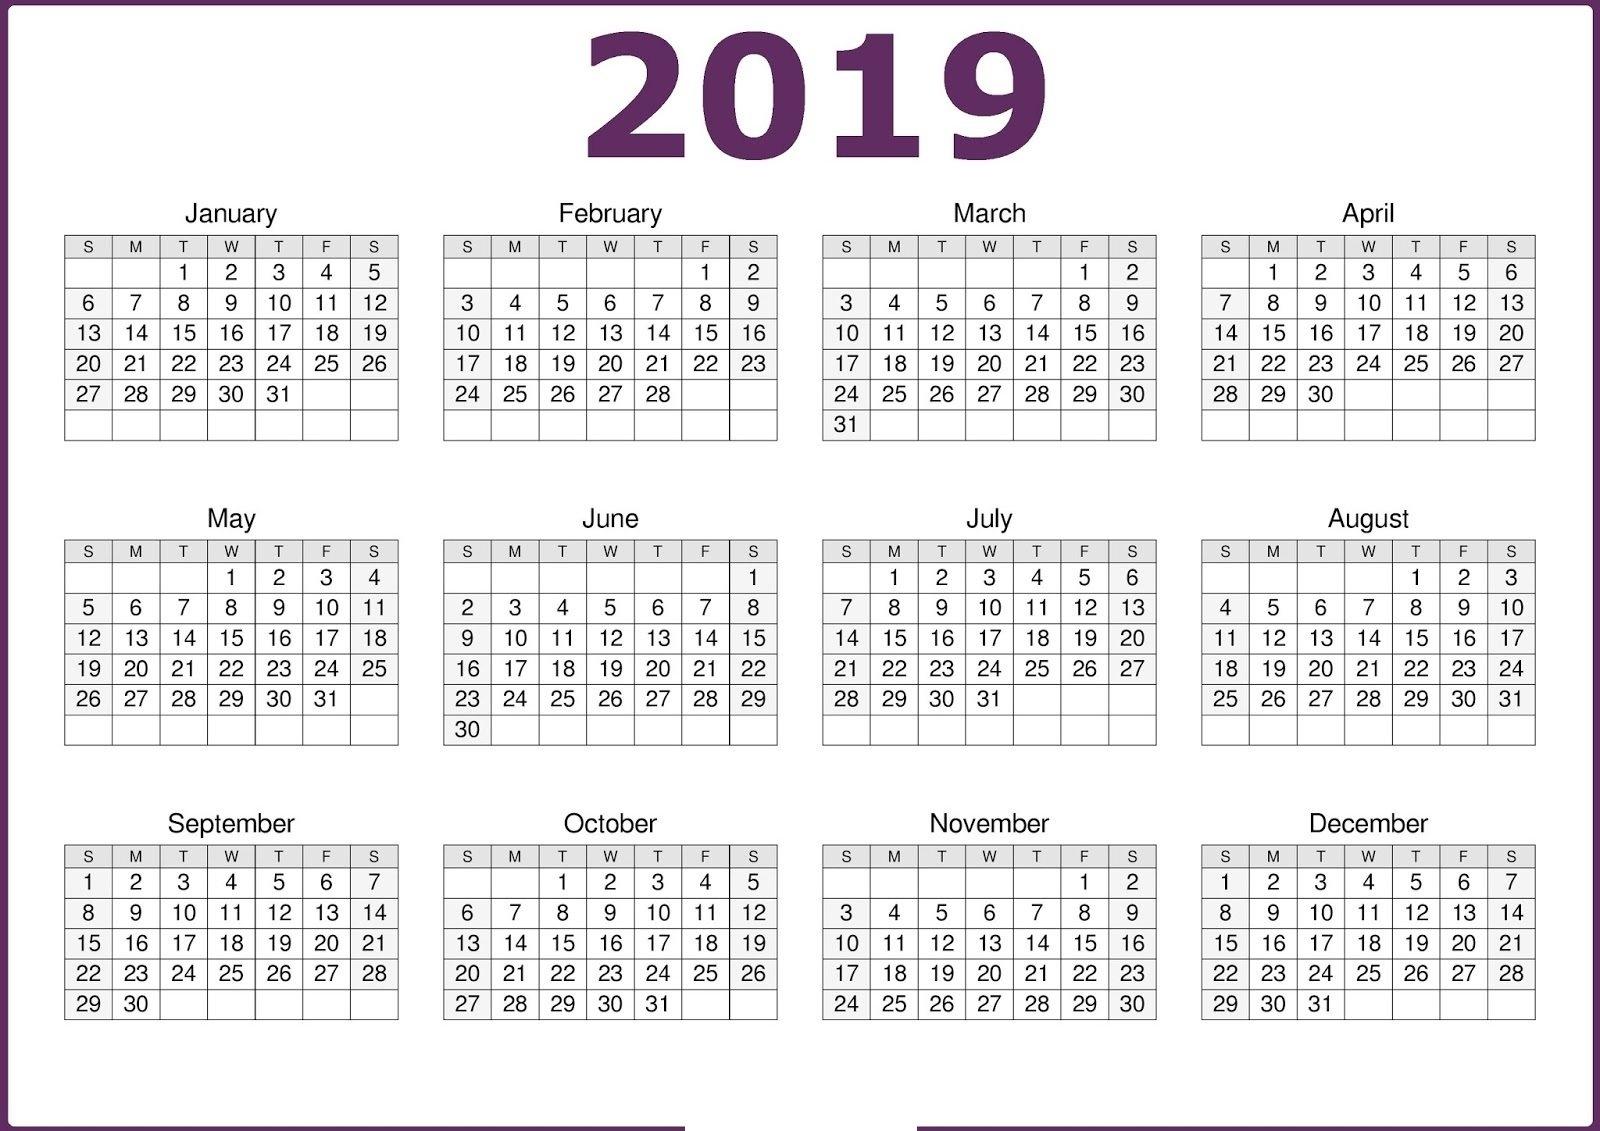 Get Free Blank Calendar Pages 2019 Templates | August 2018 Calendar 2019 Calendar Queensland Printable